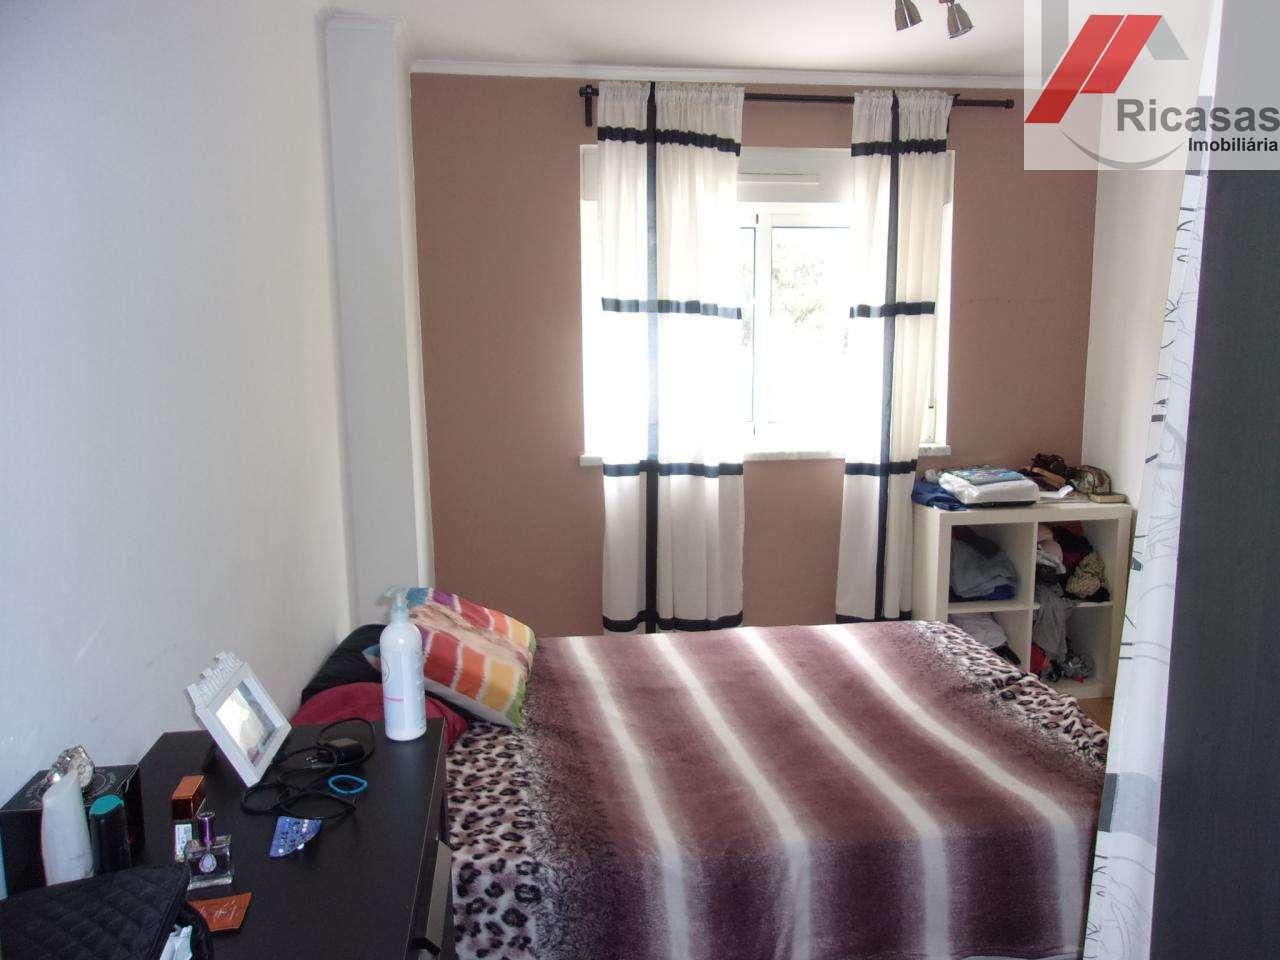 Apartamento para comprar, Marvila, Lisboa - Foto 9